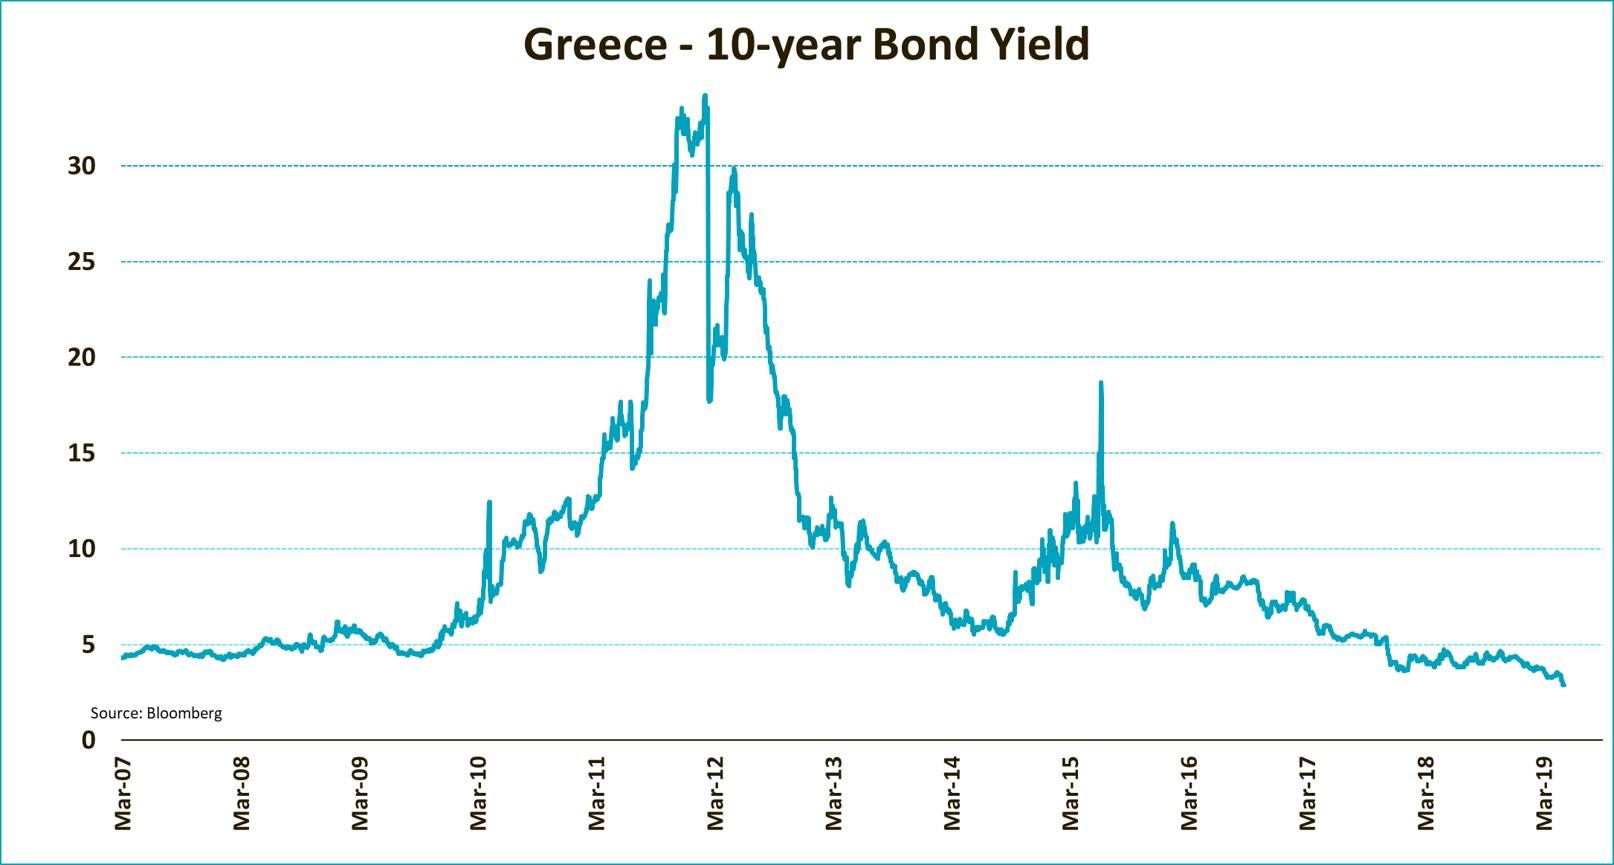 Greece 10 Year Bond Yield